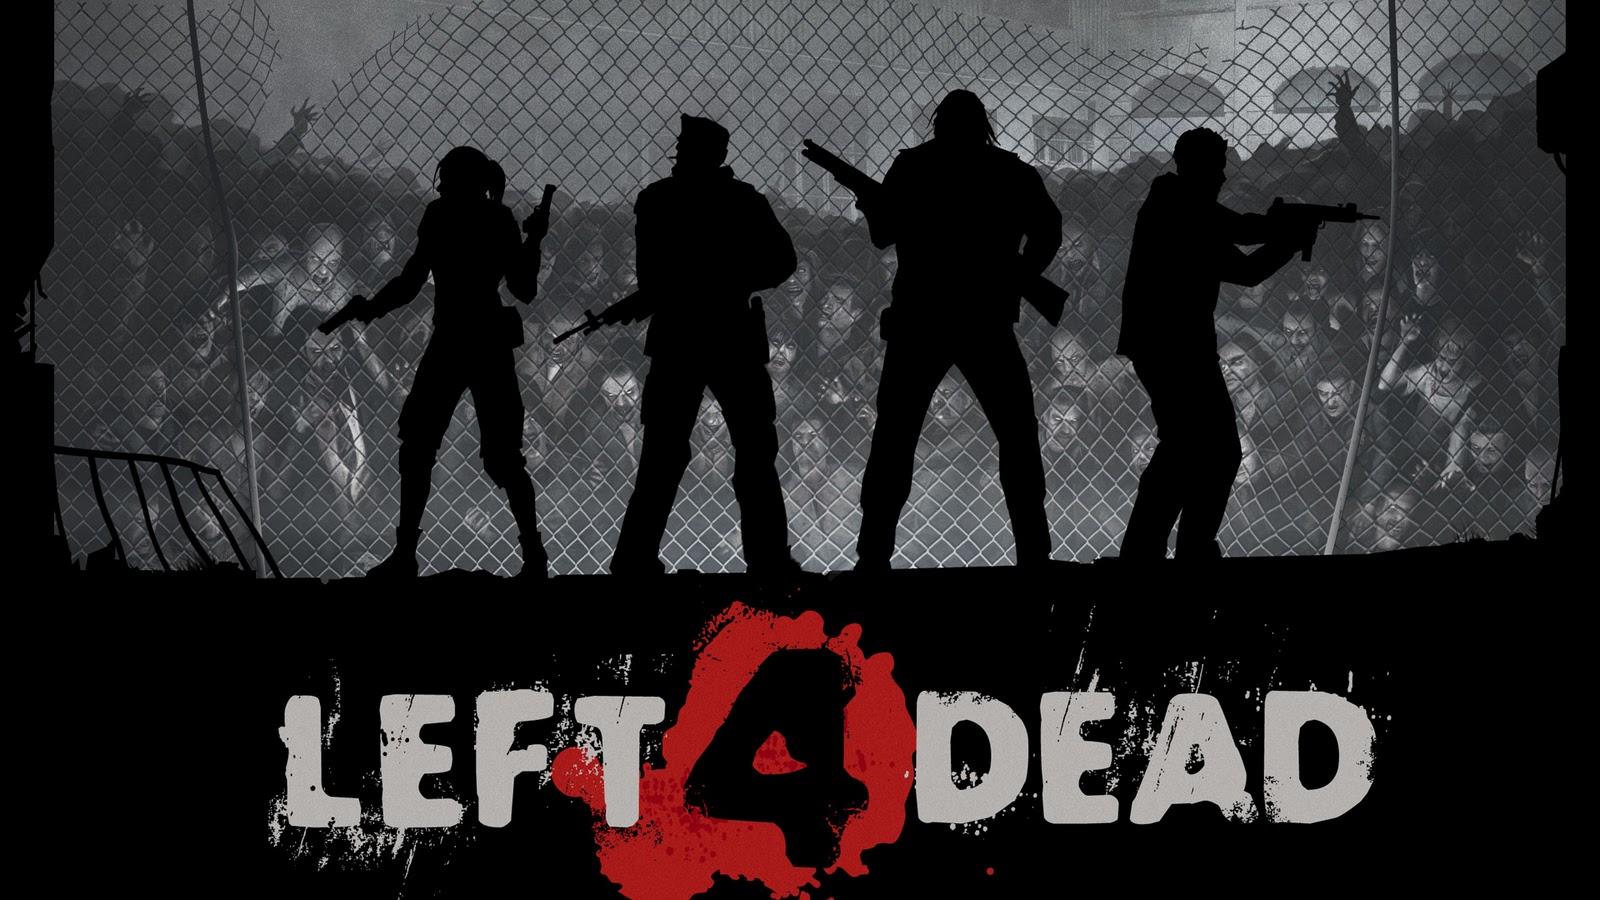 http://2.bp.blogspot.com/-5ISCsLnj_KI/Tw6DcN35e2I/AAAAAAAAAdk/cxe_xr34Imw/s1600/Left-4-Dead-Game-Wallpaper.jpg